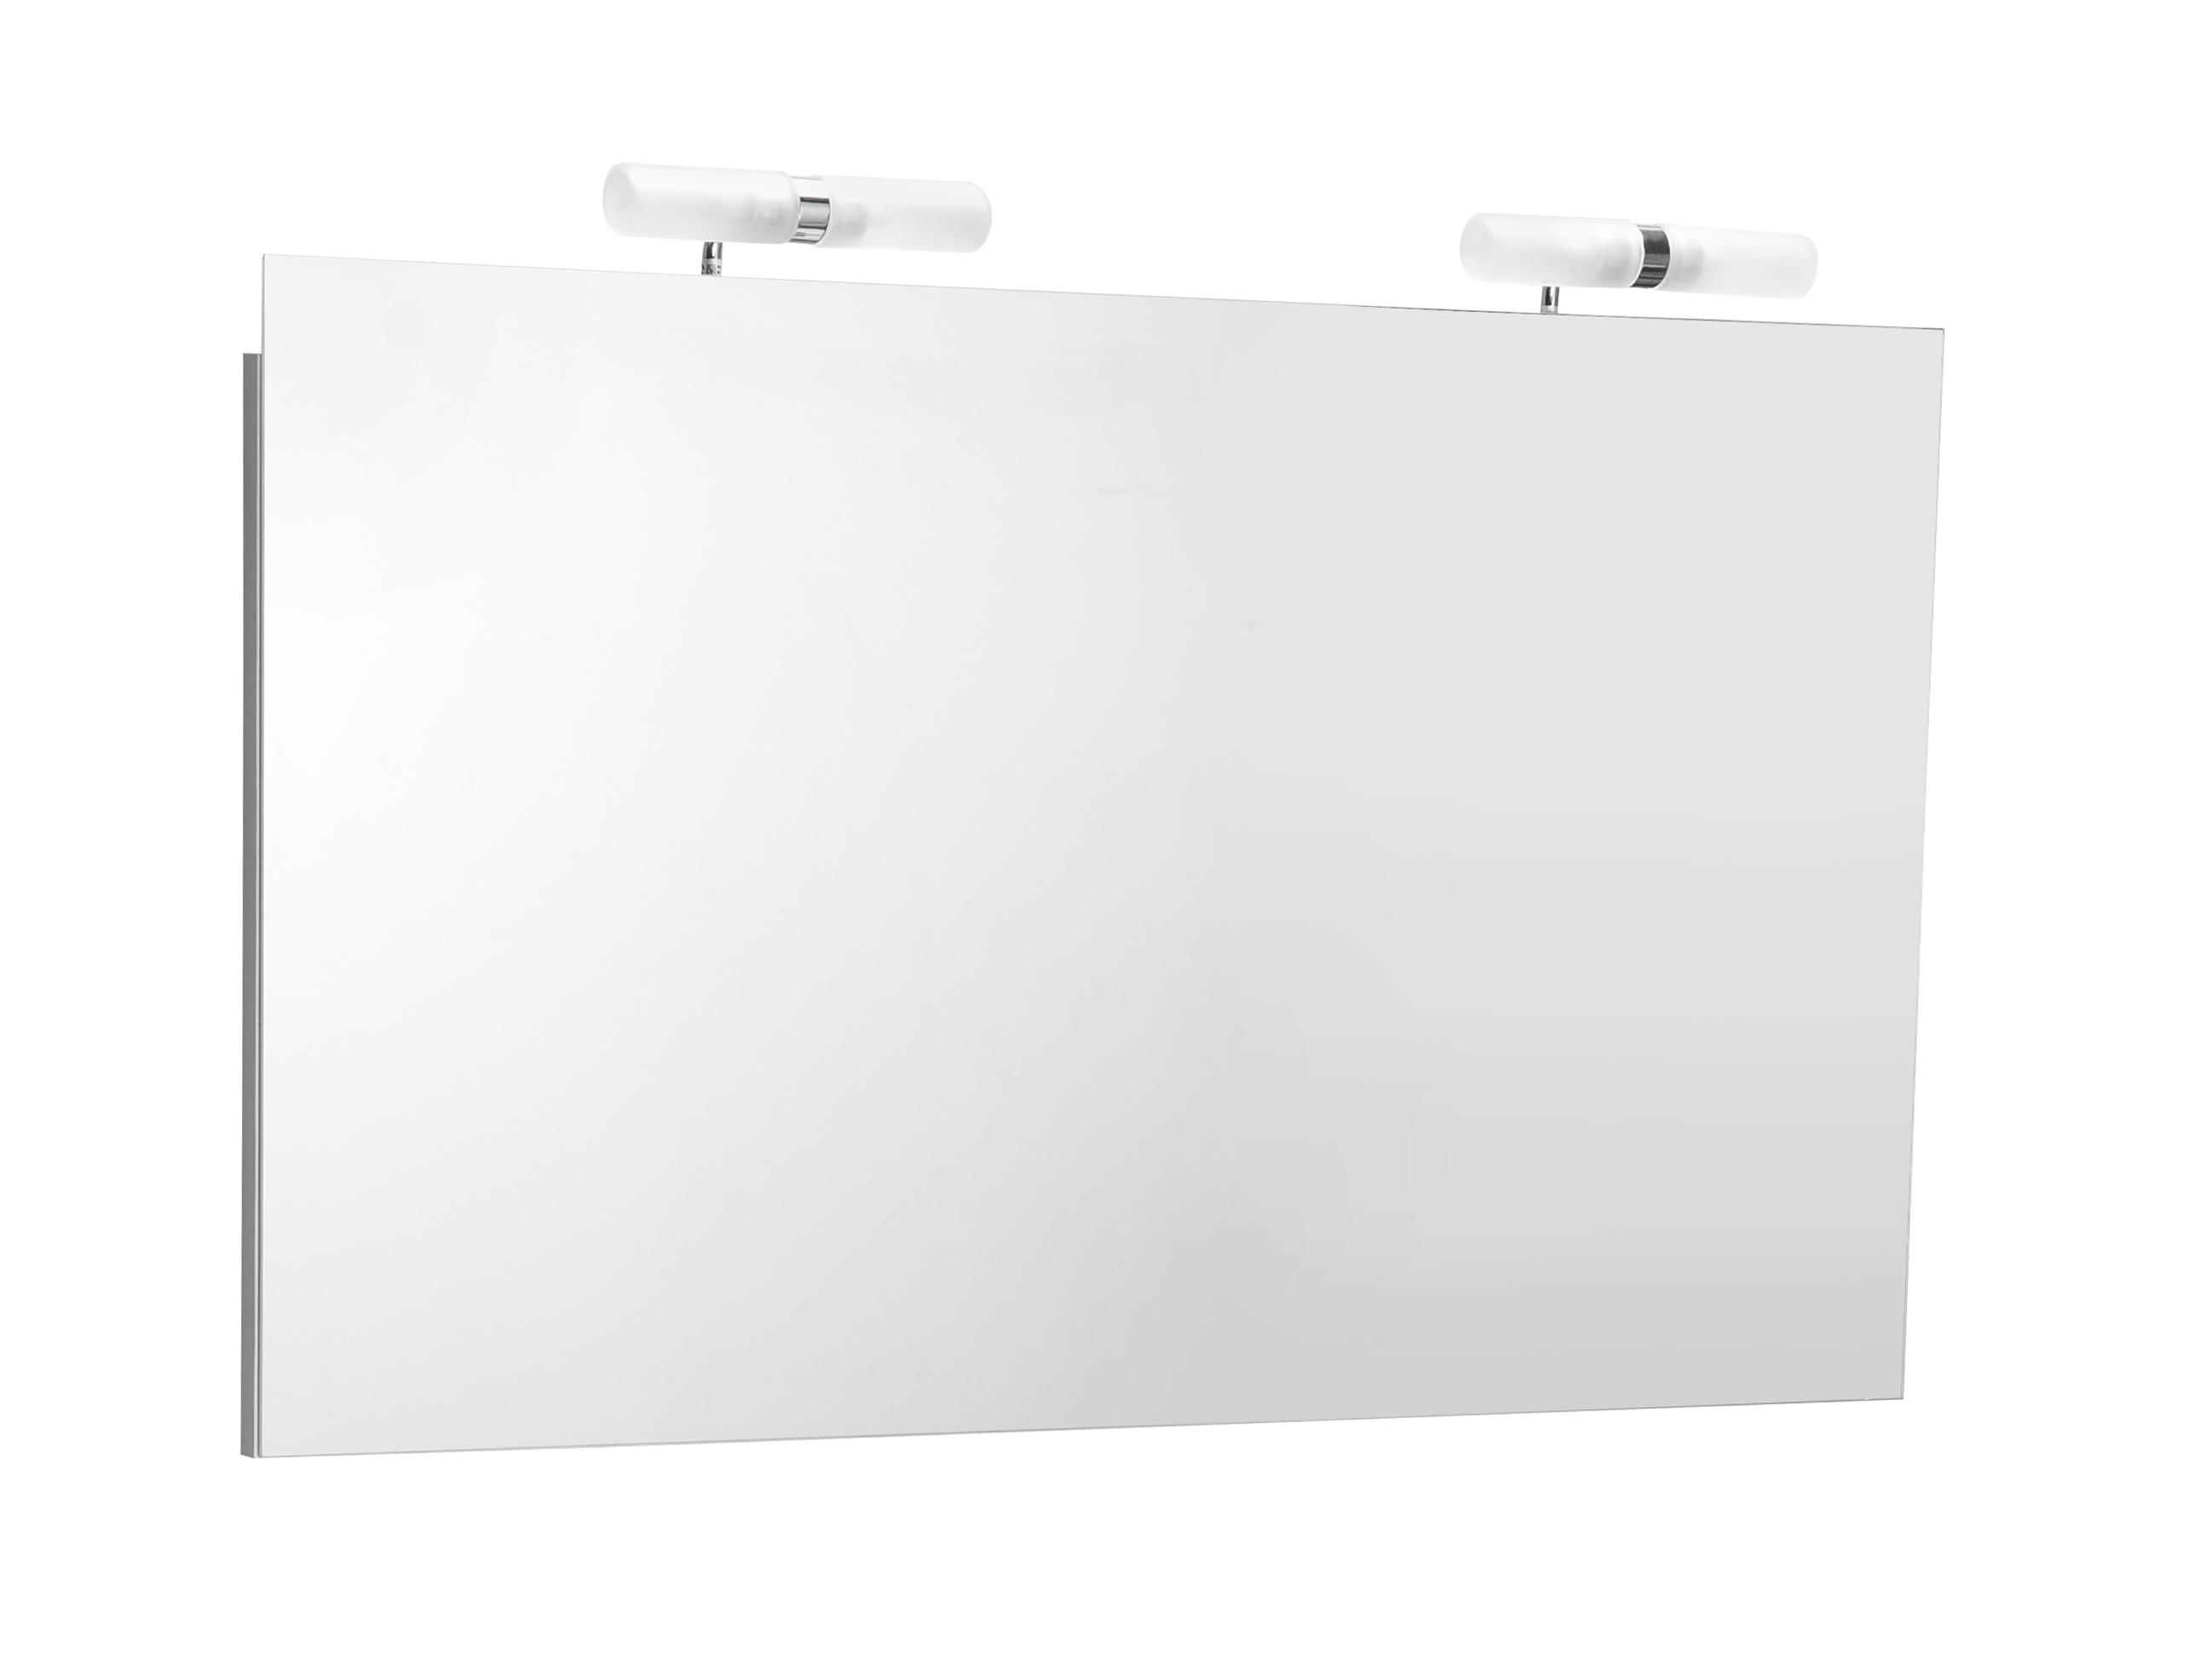 Miroir miroir deco aquarine pro for Miroir salle de bain 150 cm